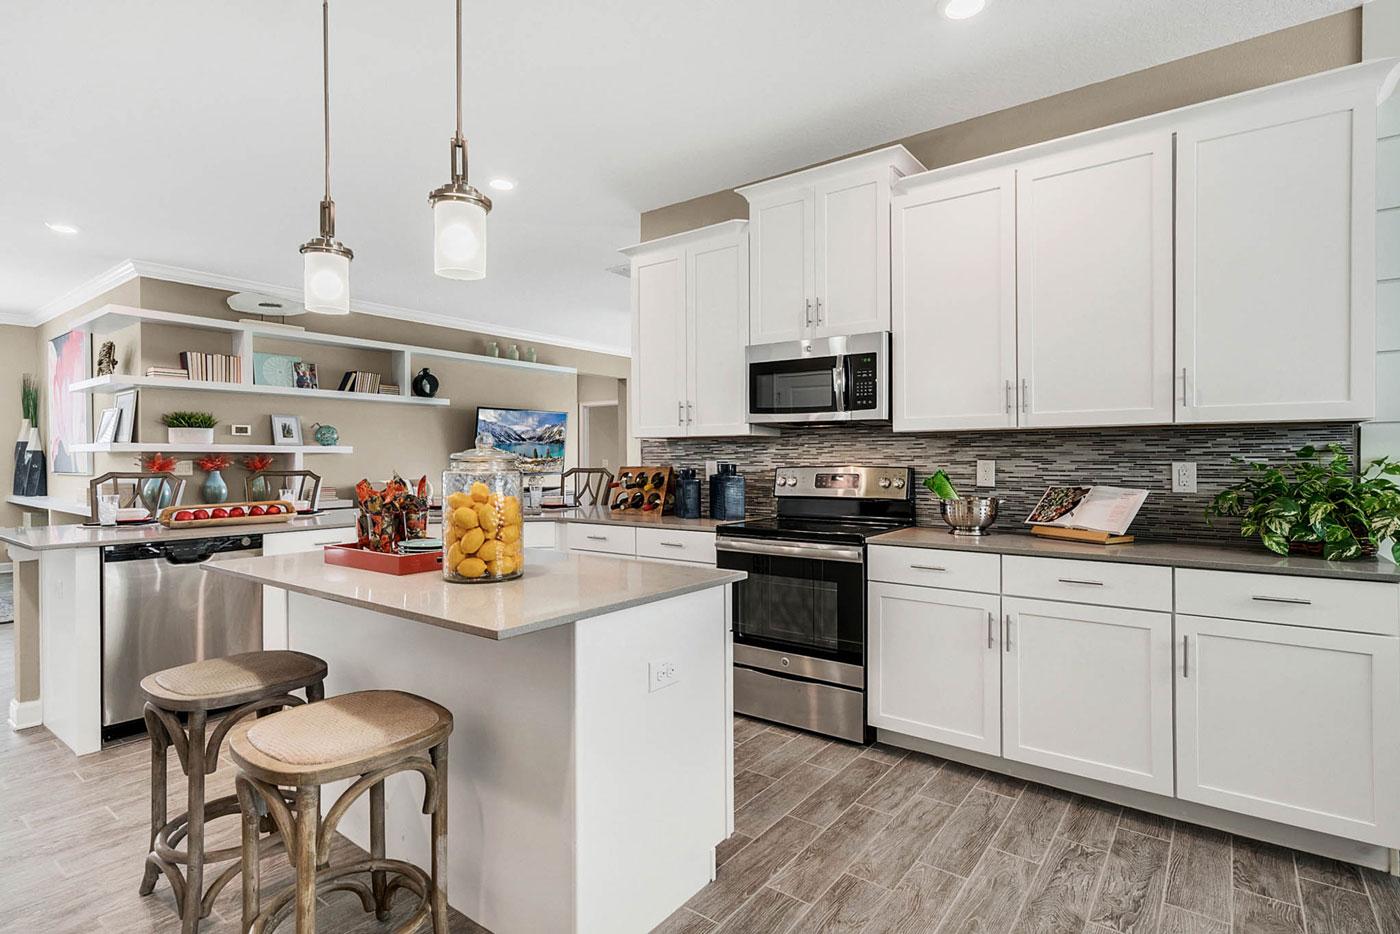 Interior Design and Merchandising of Model Homes | Lita ... on Model Kitchens  id=94770